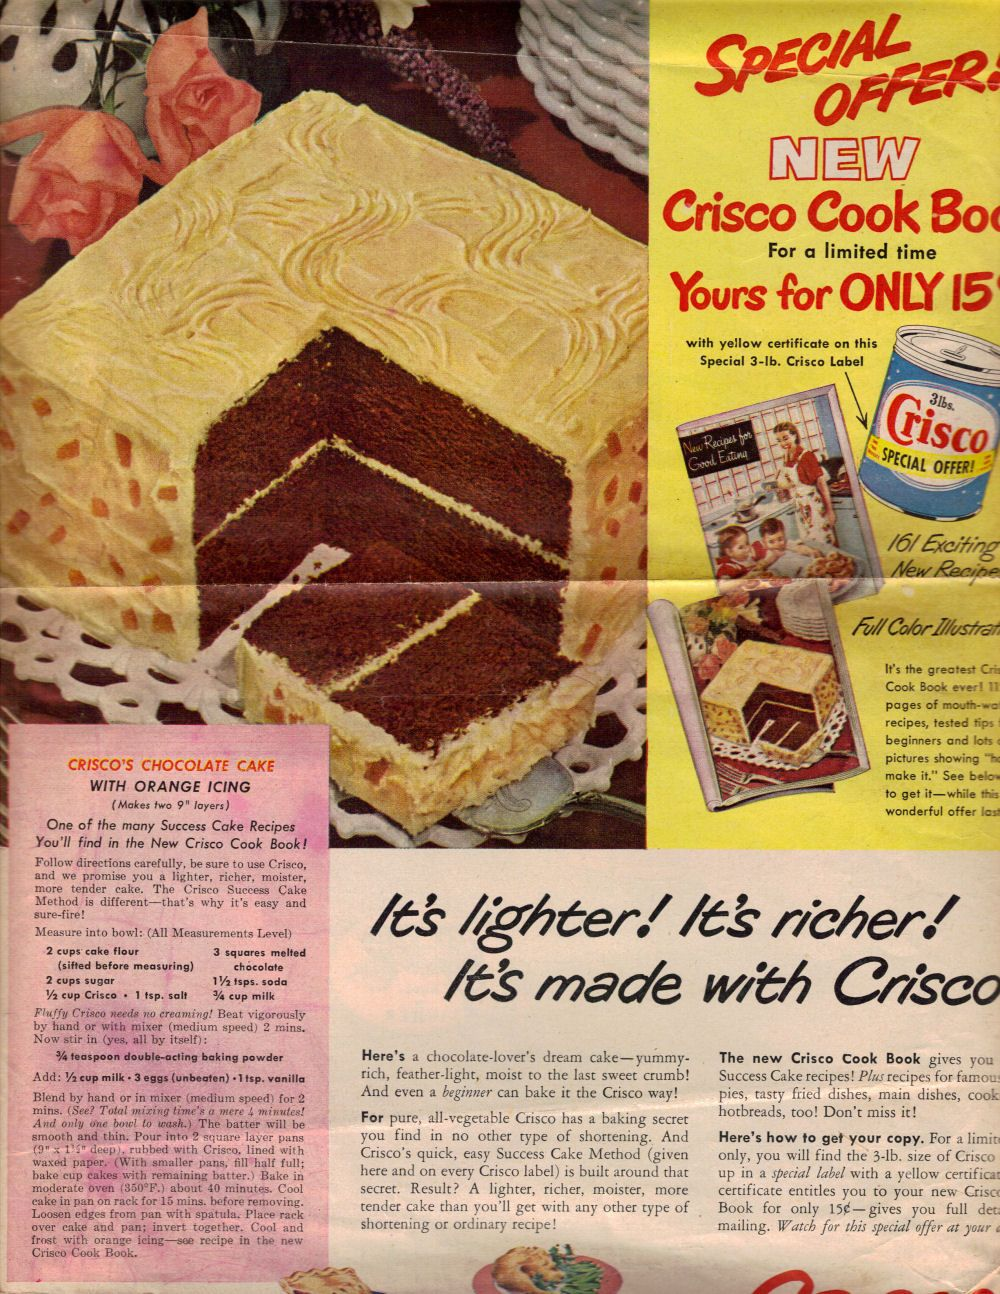 Crisco S Chocolate Cake Vintage Recipe Click To View Larger Vintage Recipes Vintage Cake Vintage Cooking